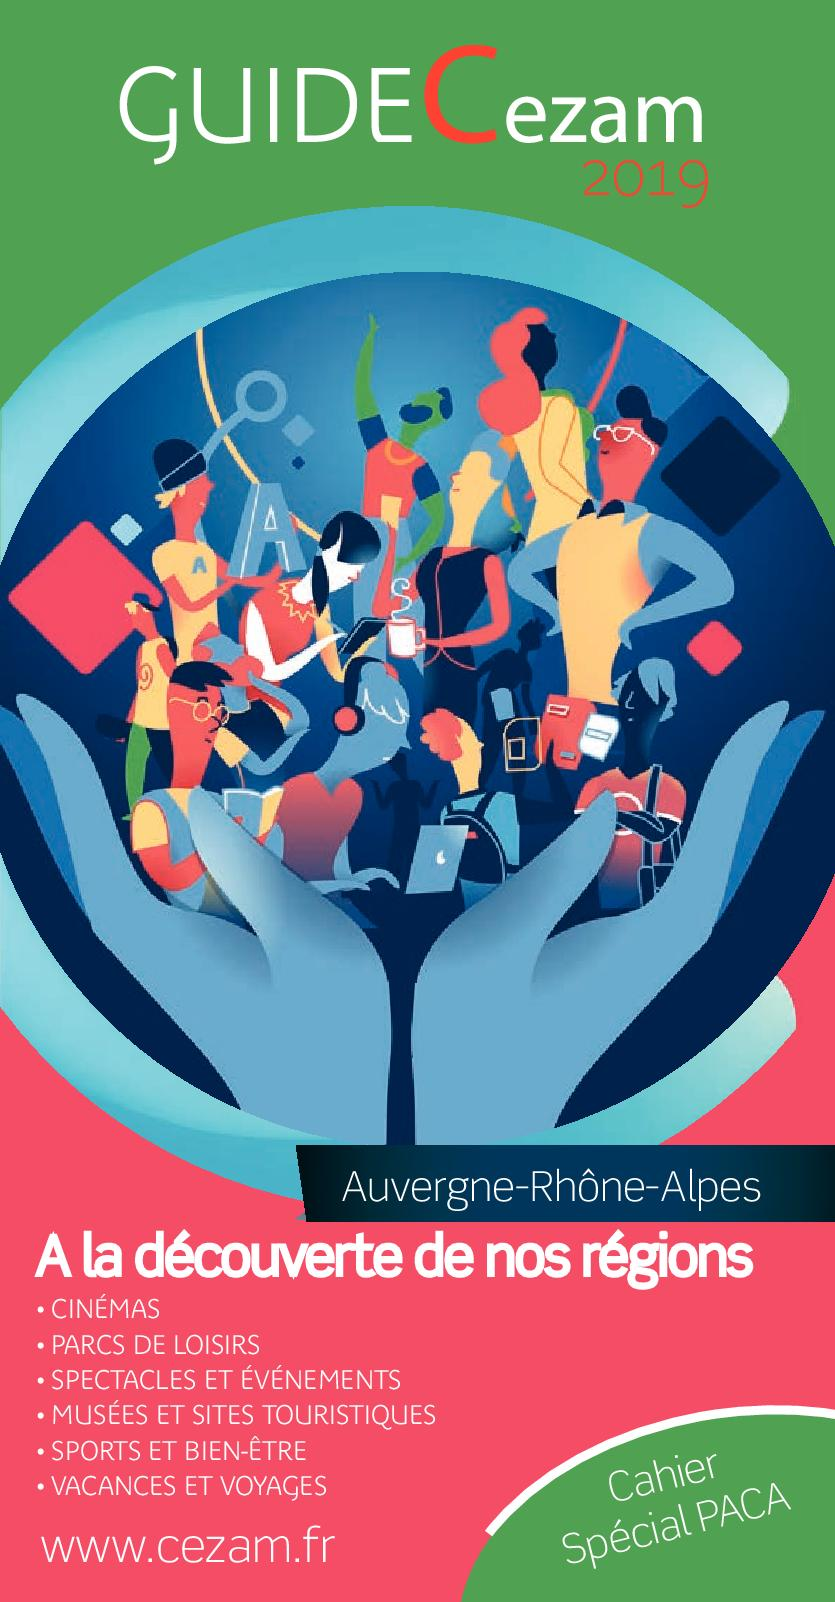 Carte Cezam Superbesse.Calameo Guide Cezam Auvergne Rhone Alpe 2019